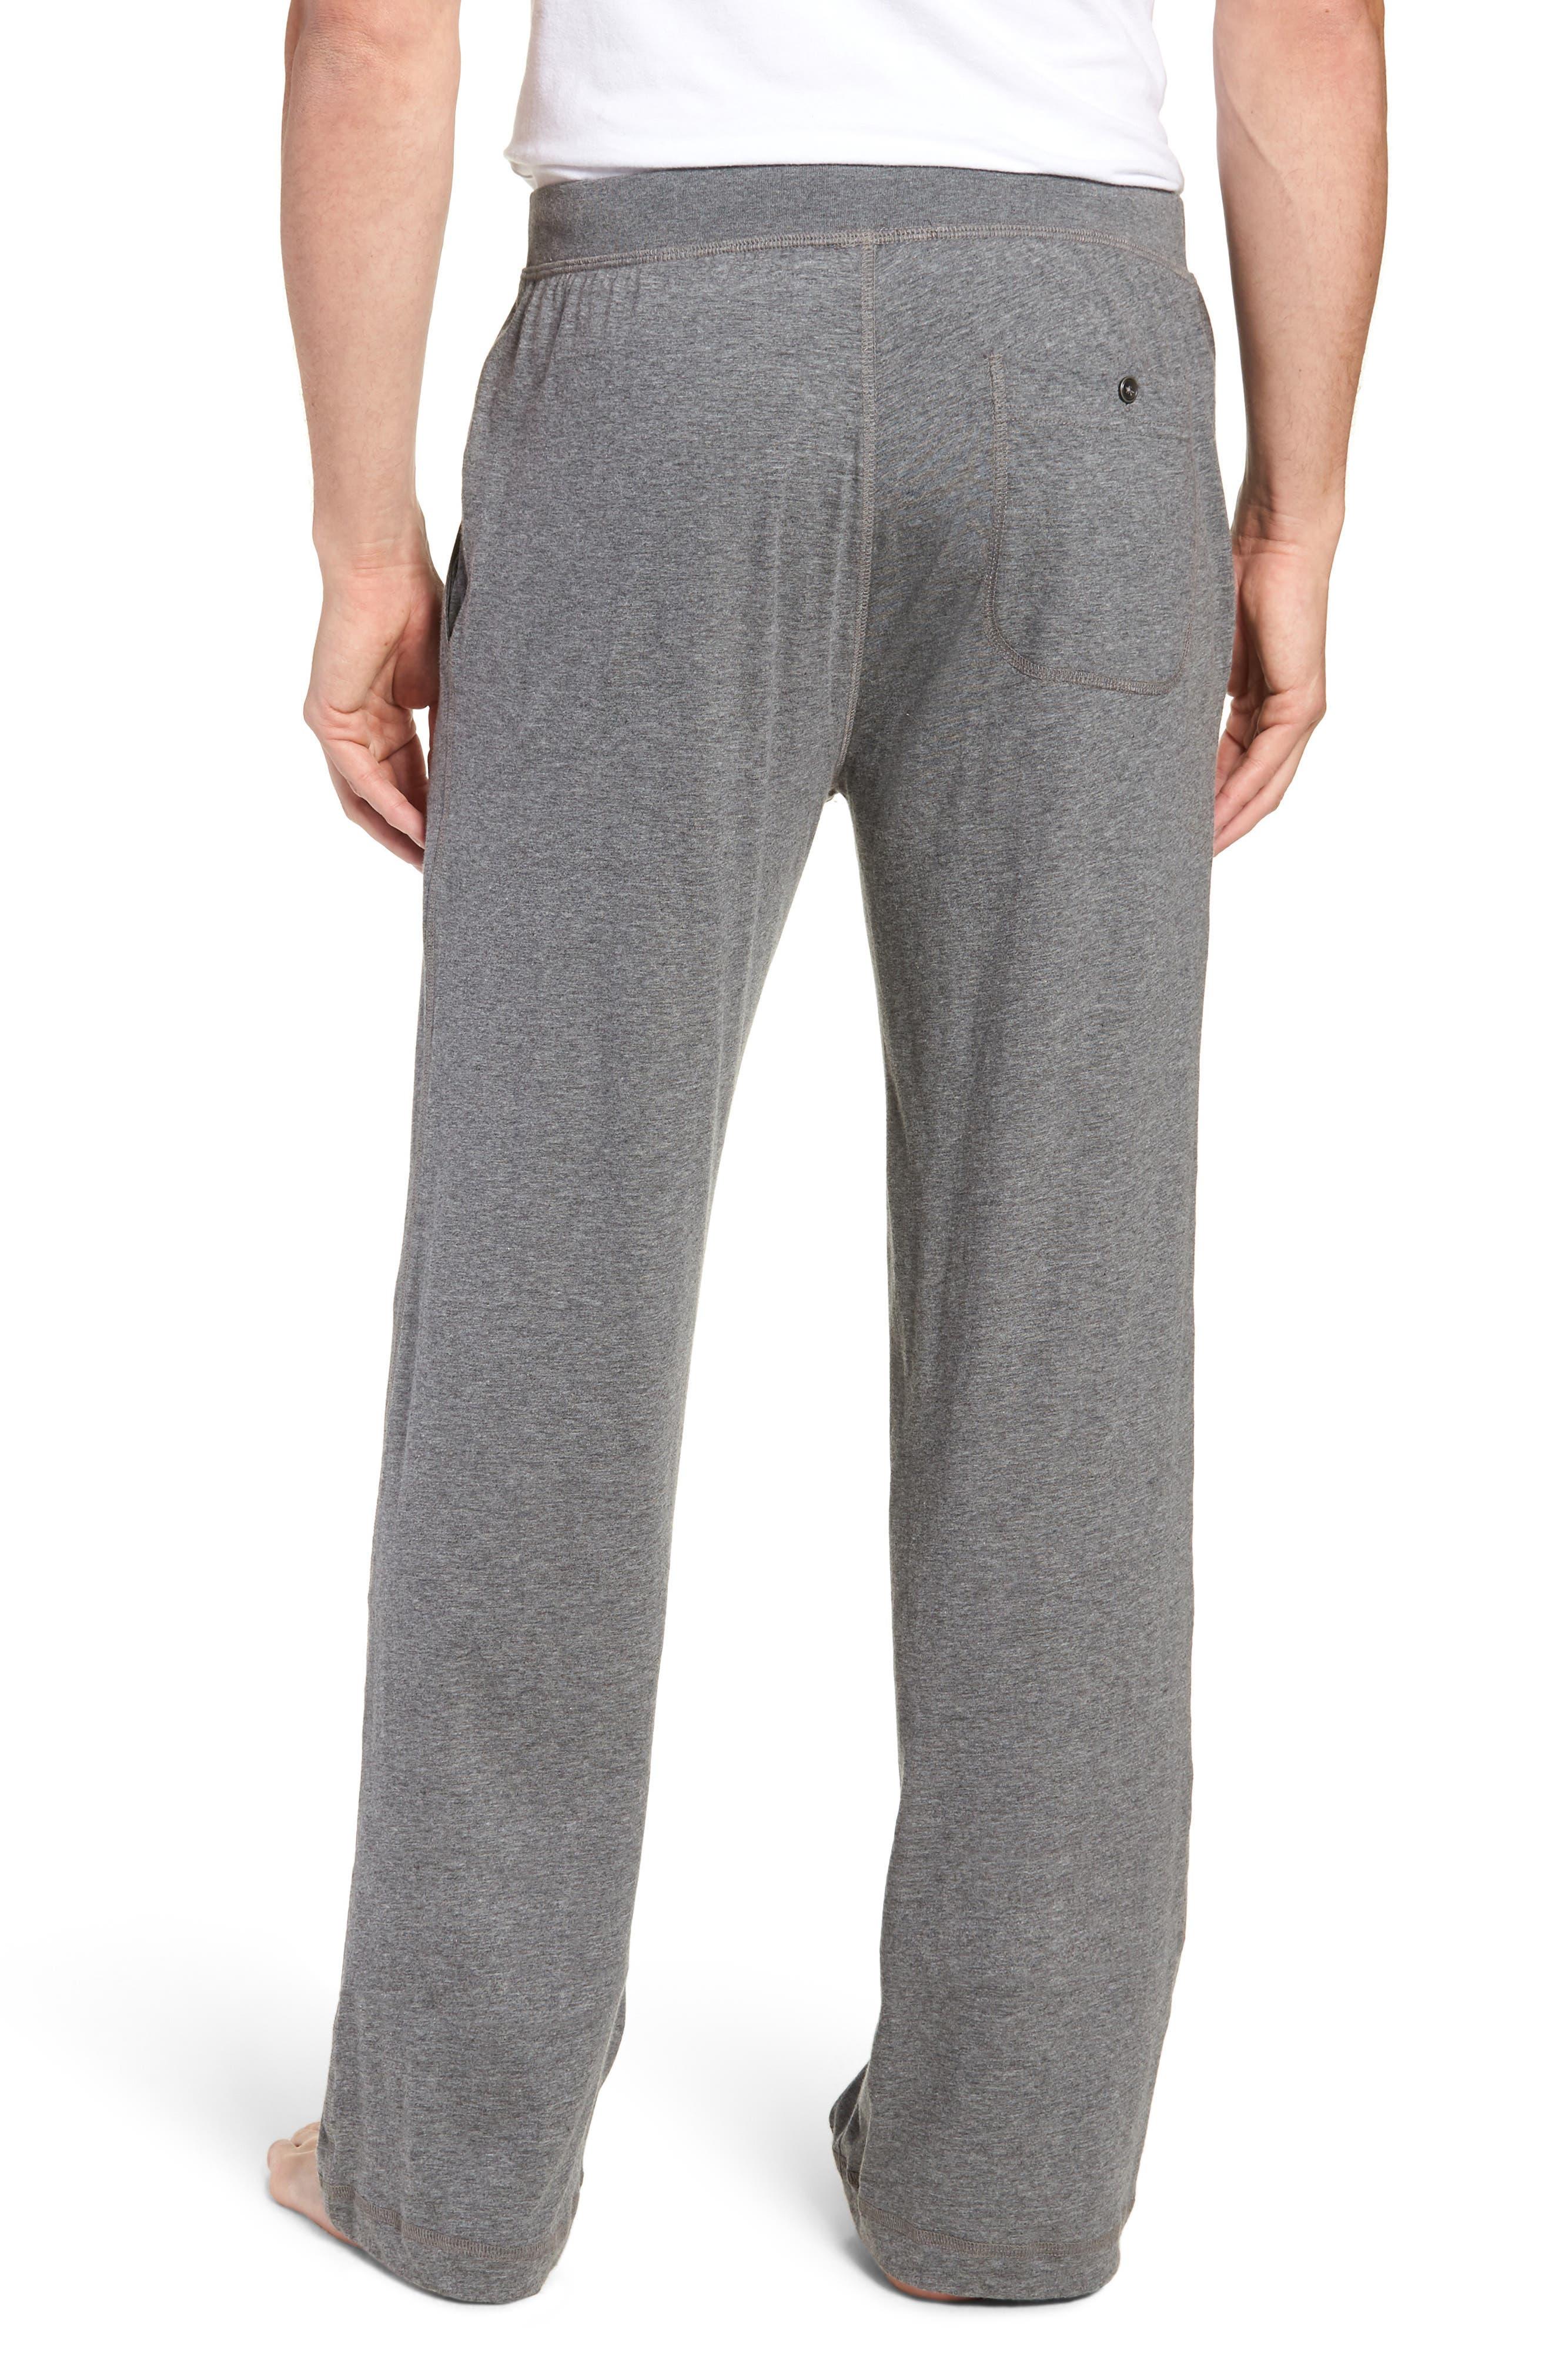 Peruvian Pima Lightweight Cotton Lounge Pants,                             Alternate thumbnail 2, color,                             CHARCOAL HEATHER